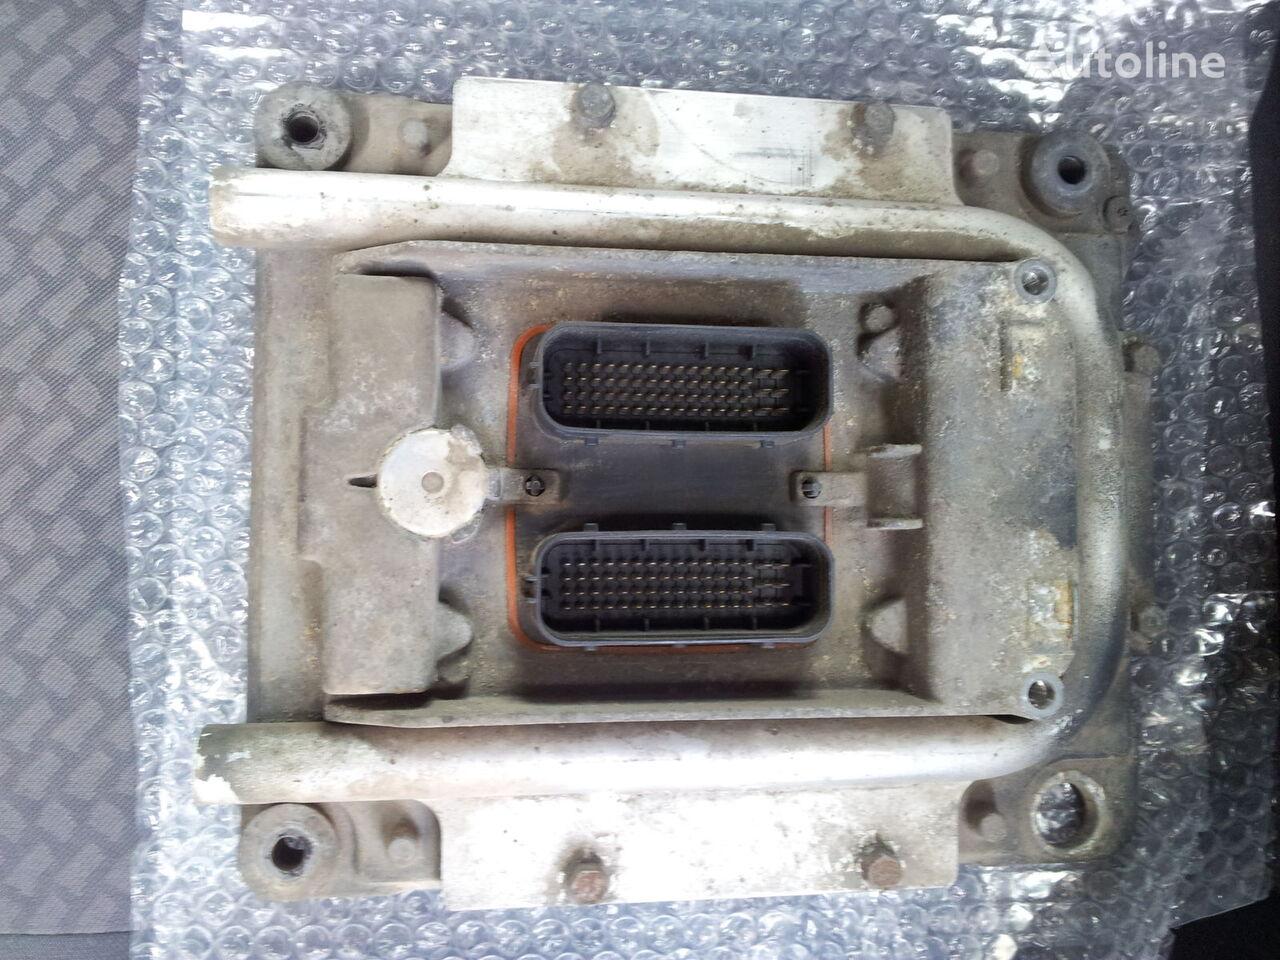 Renault ECU control unit, engine control unit, 20814604 P01 control unit for RENAULT Premium DXI tractor unit